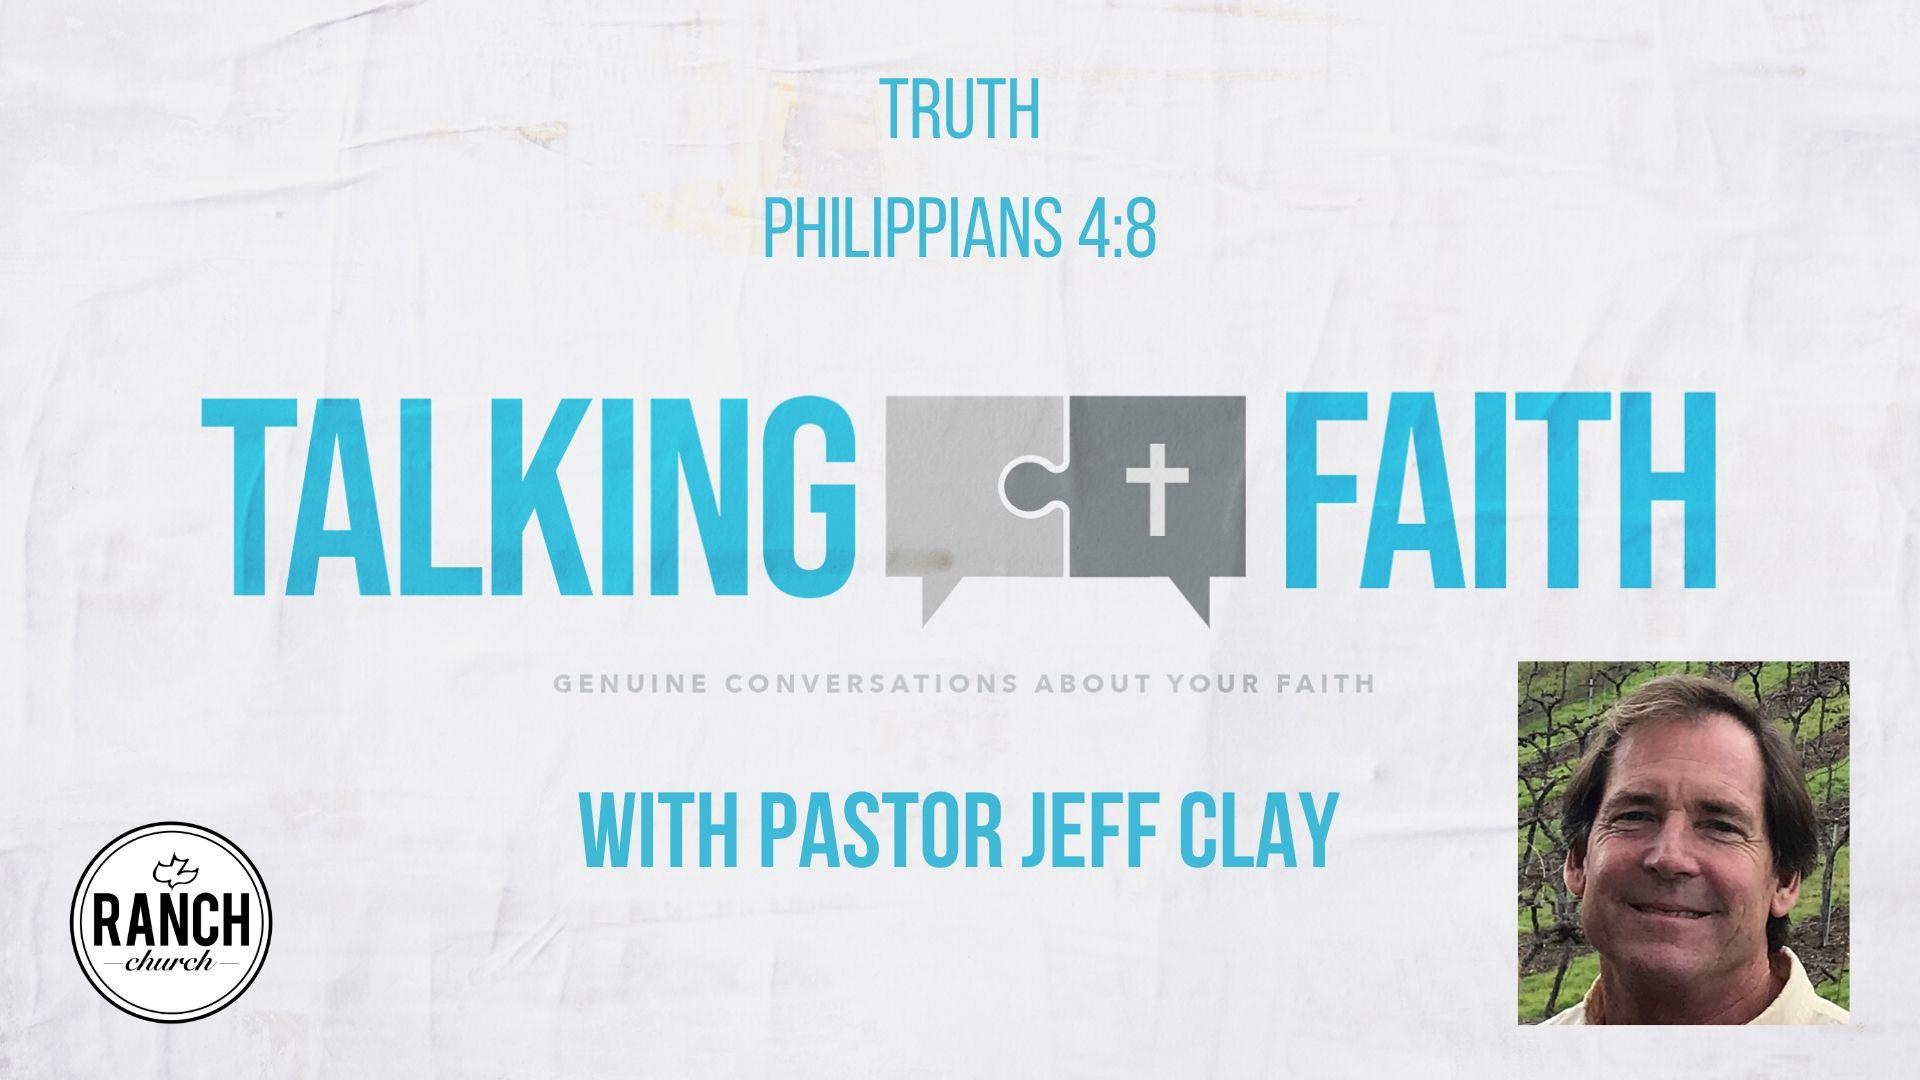 TALKING FAITH 7-1-2020